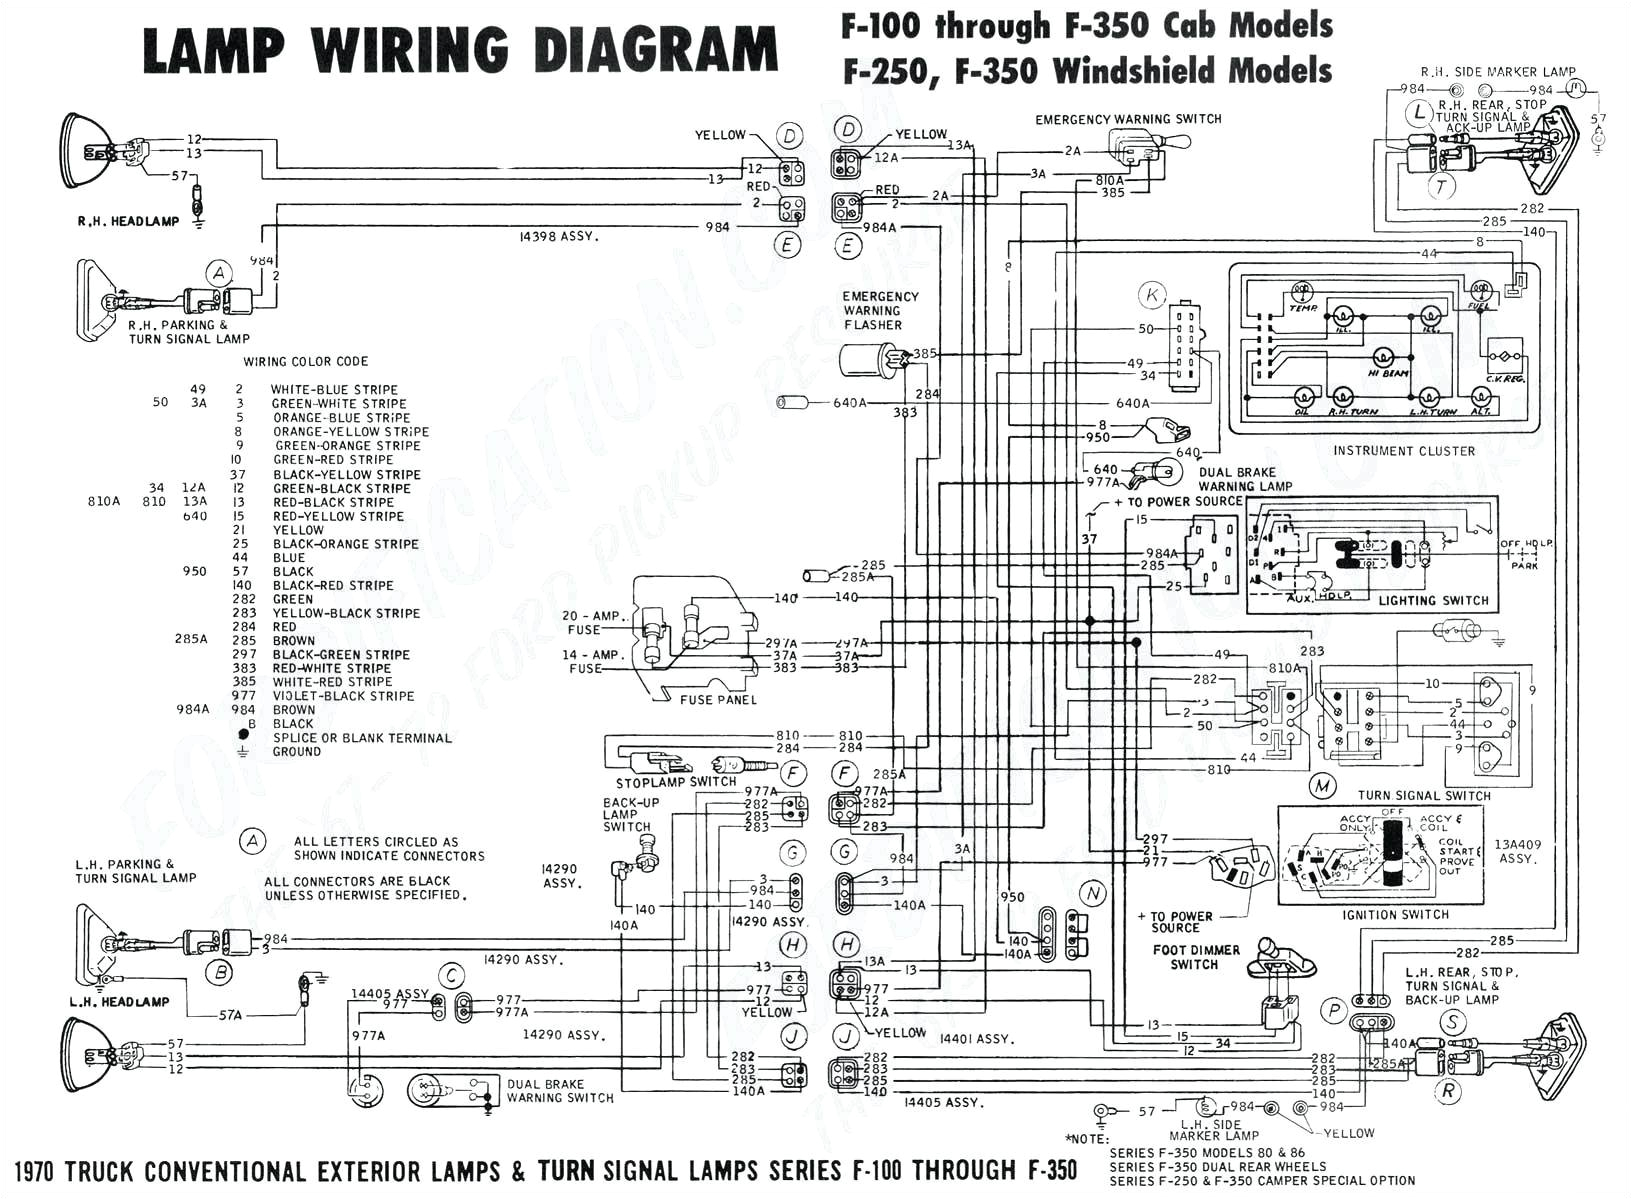 99 lincoln wiring diagram wiring diagram datasource 99 lincoln navigator fuel pump wiring diagram 99 lincoln